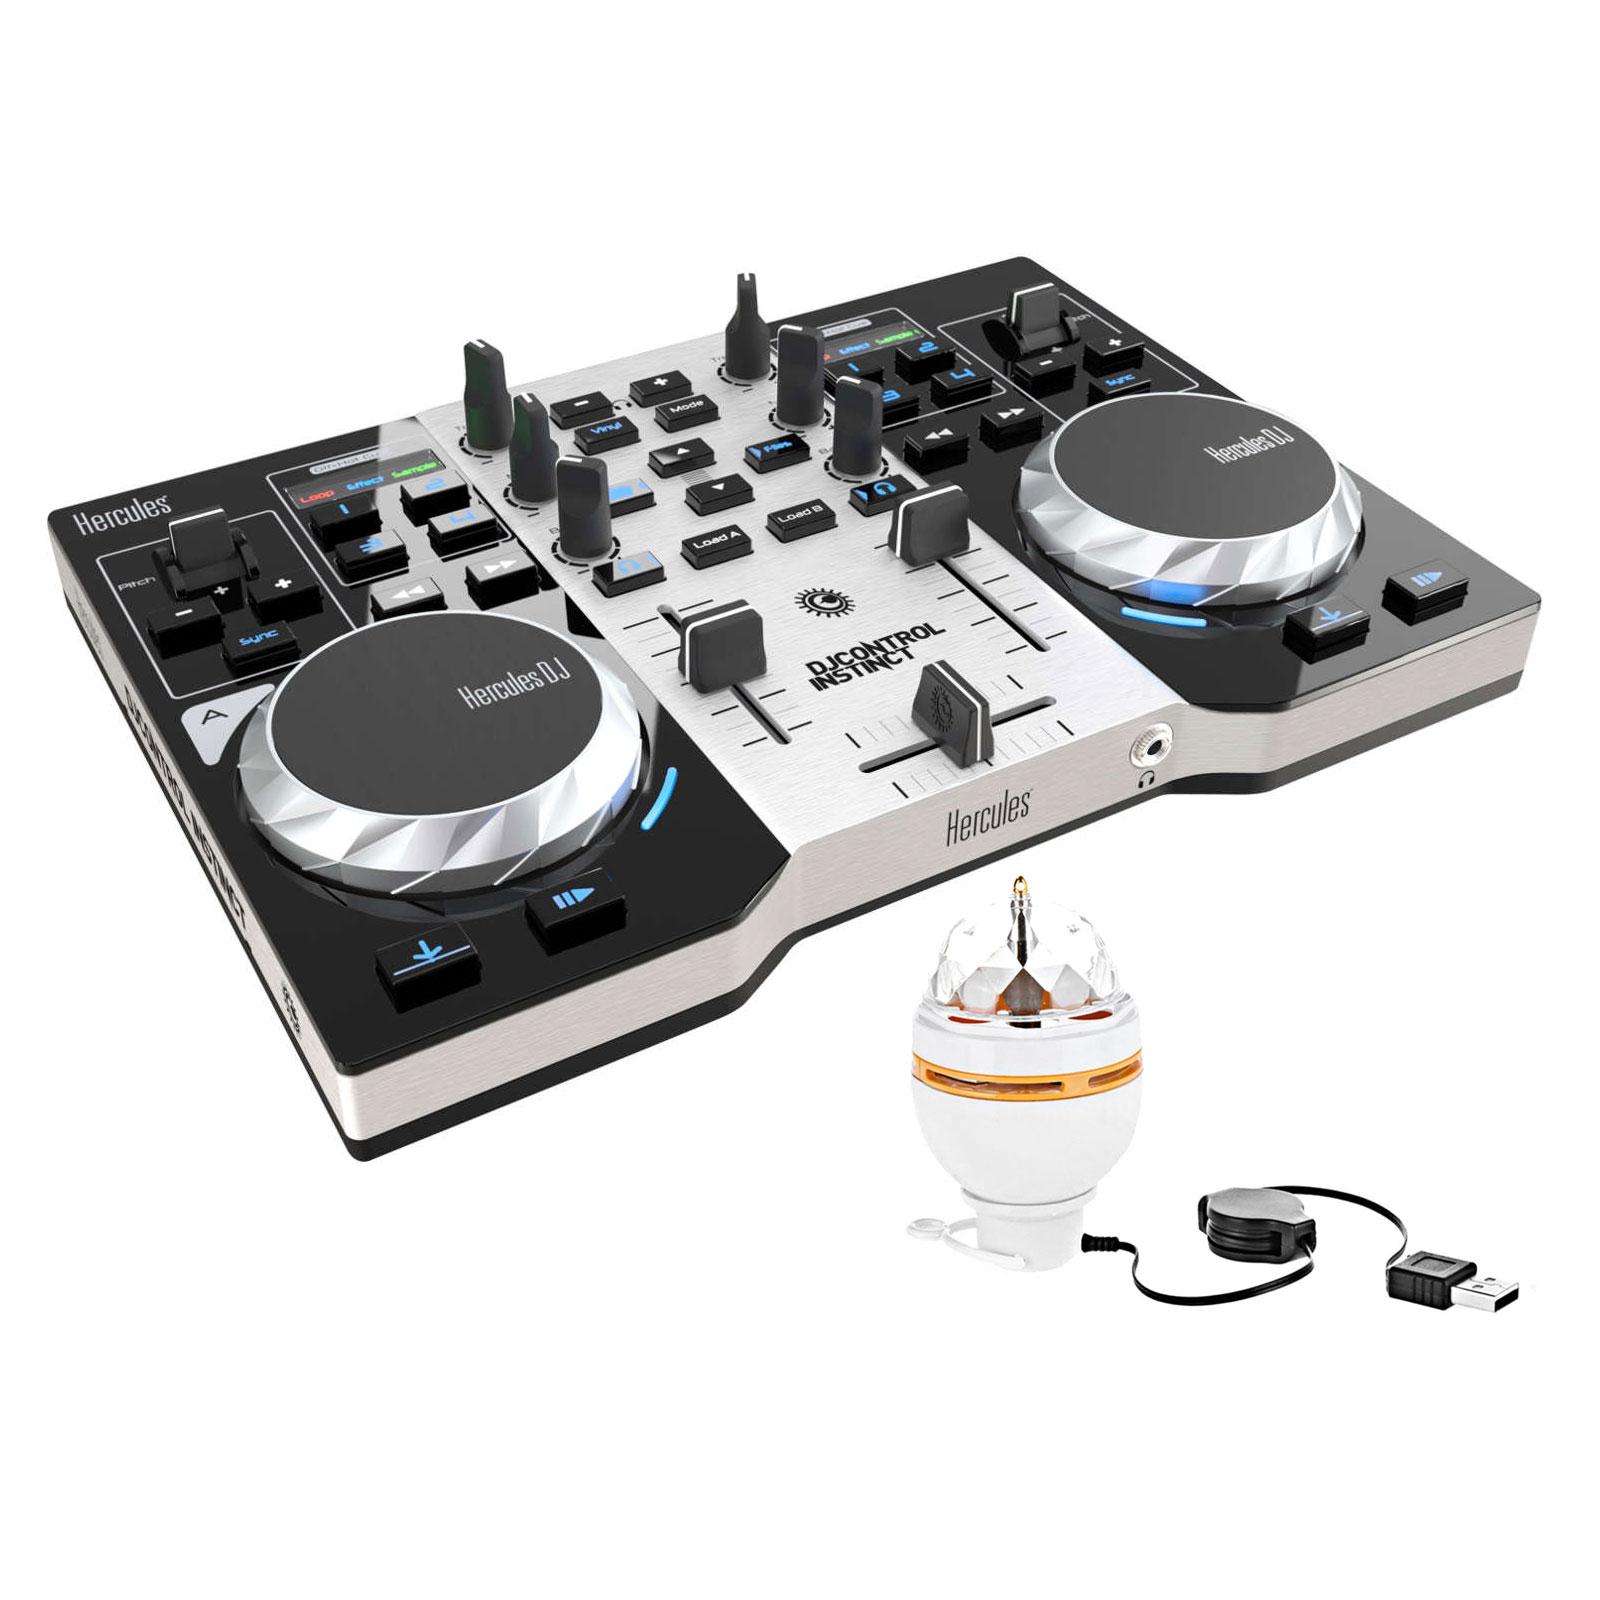 hercules djcontrol instinct party pack table de mixage hercules sur. Black Bedroom Furniture Sets. Home Design Ideas